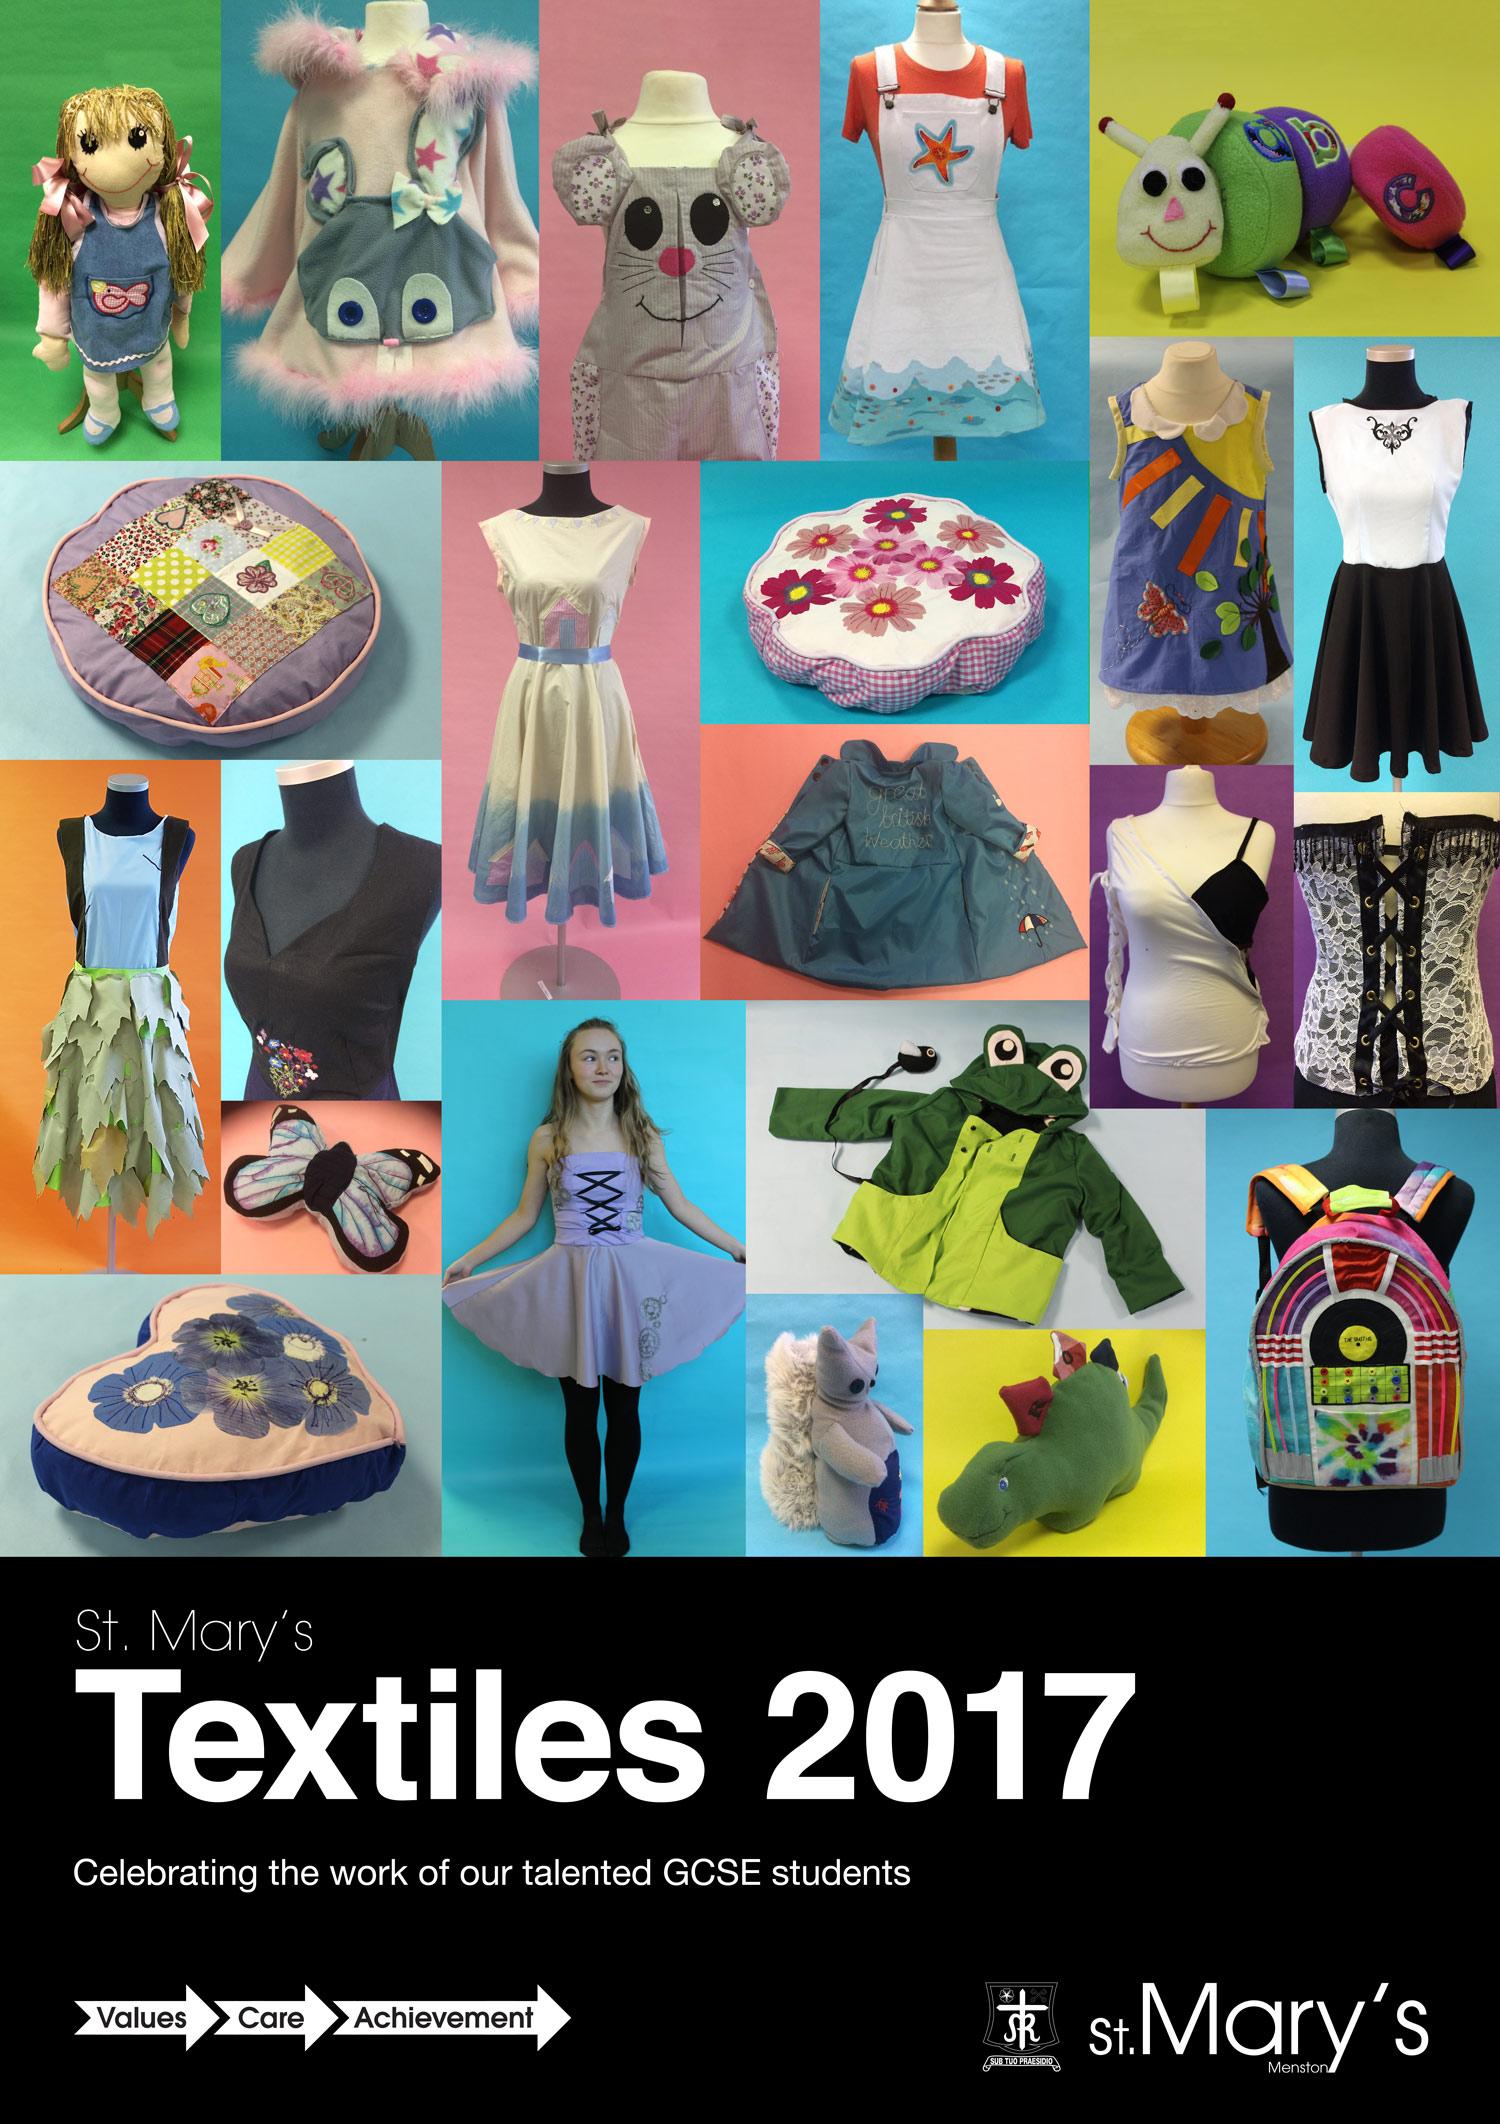 A1-textiles-2017-work-in-progress-1.jpg